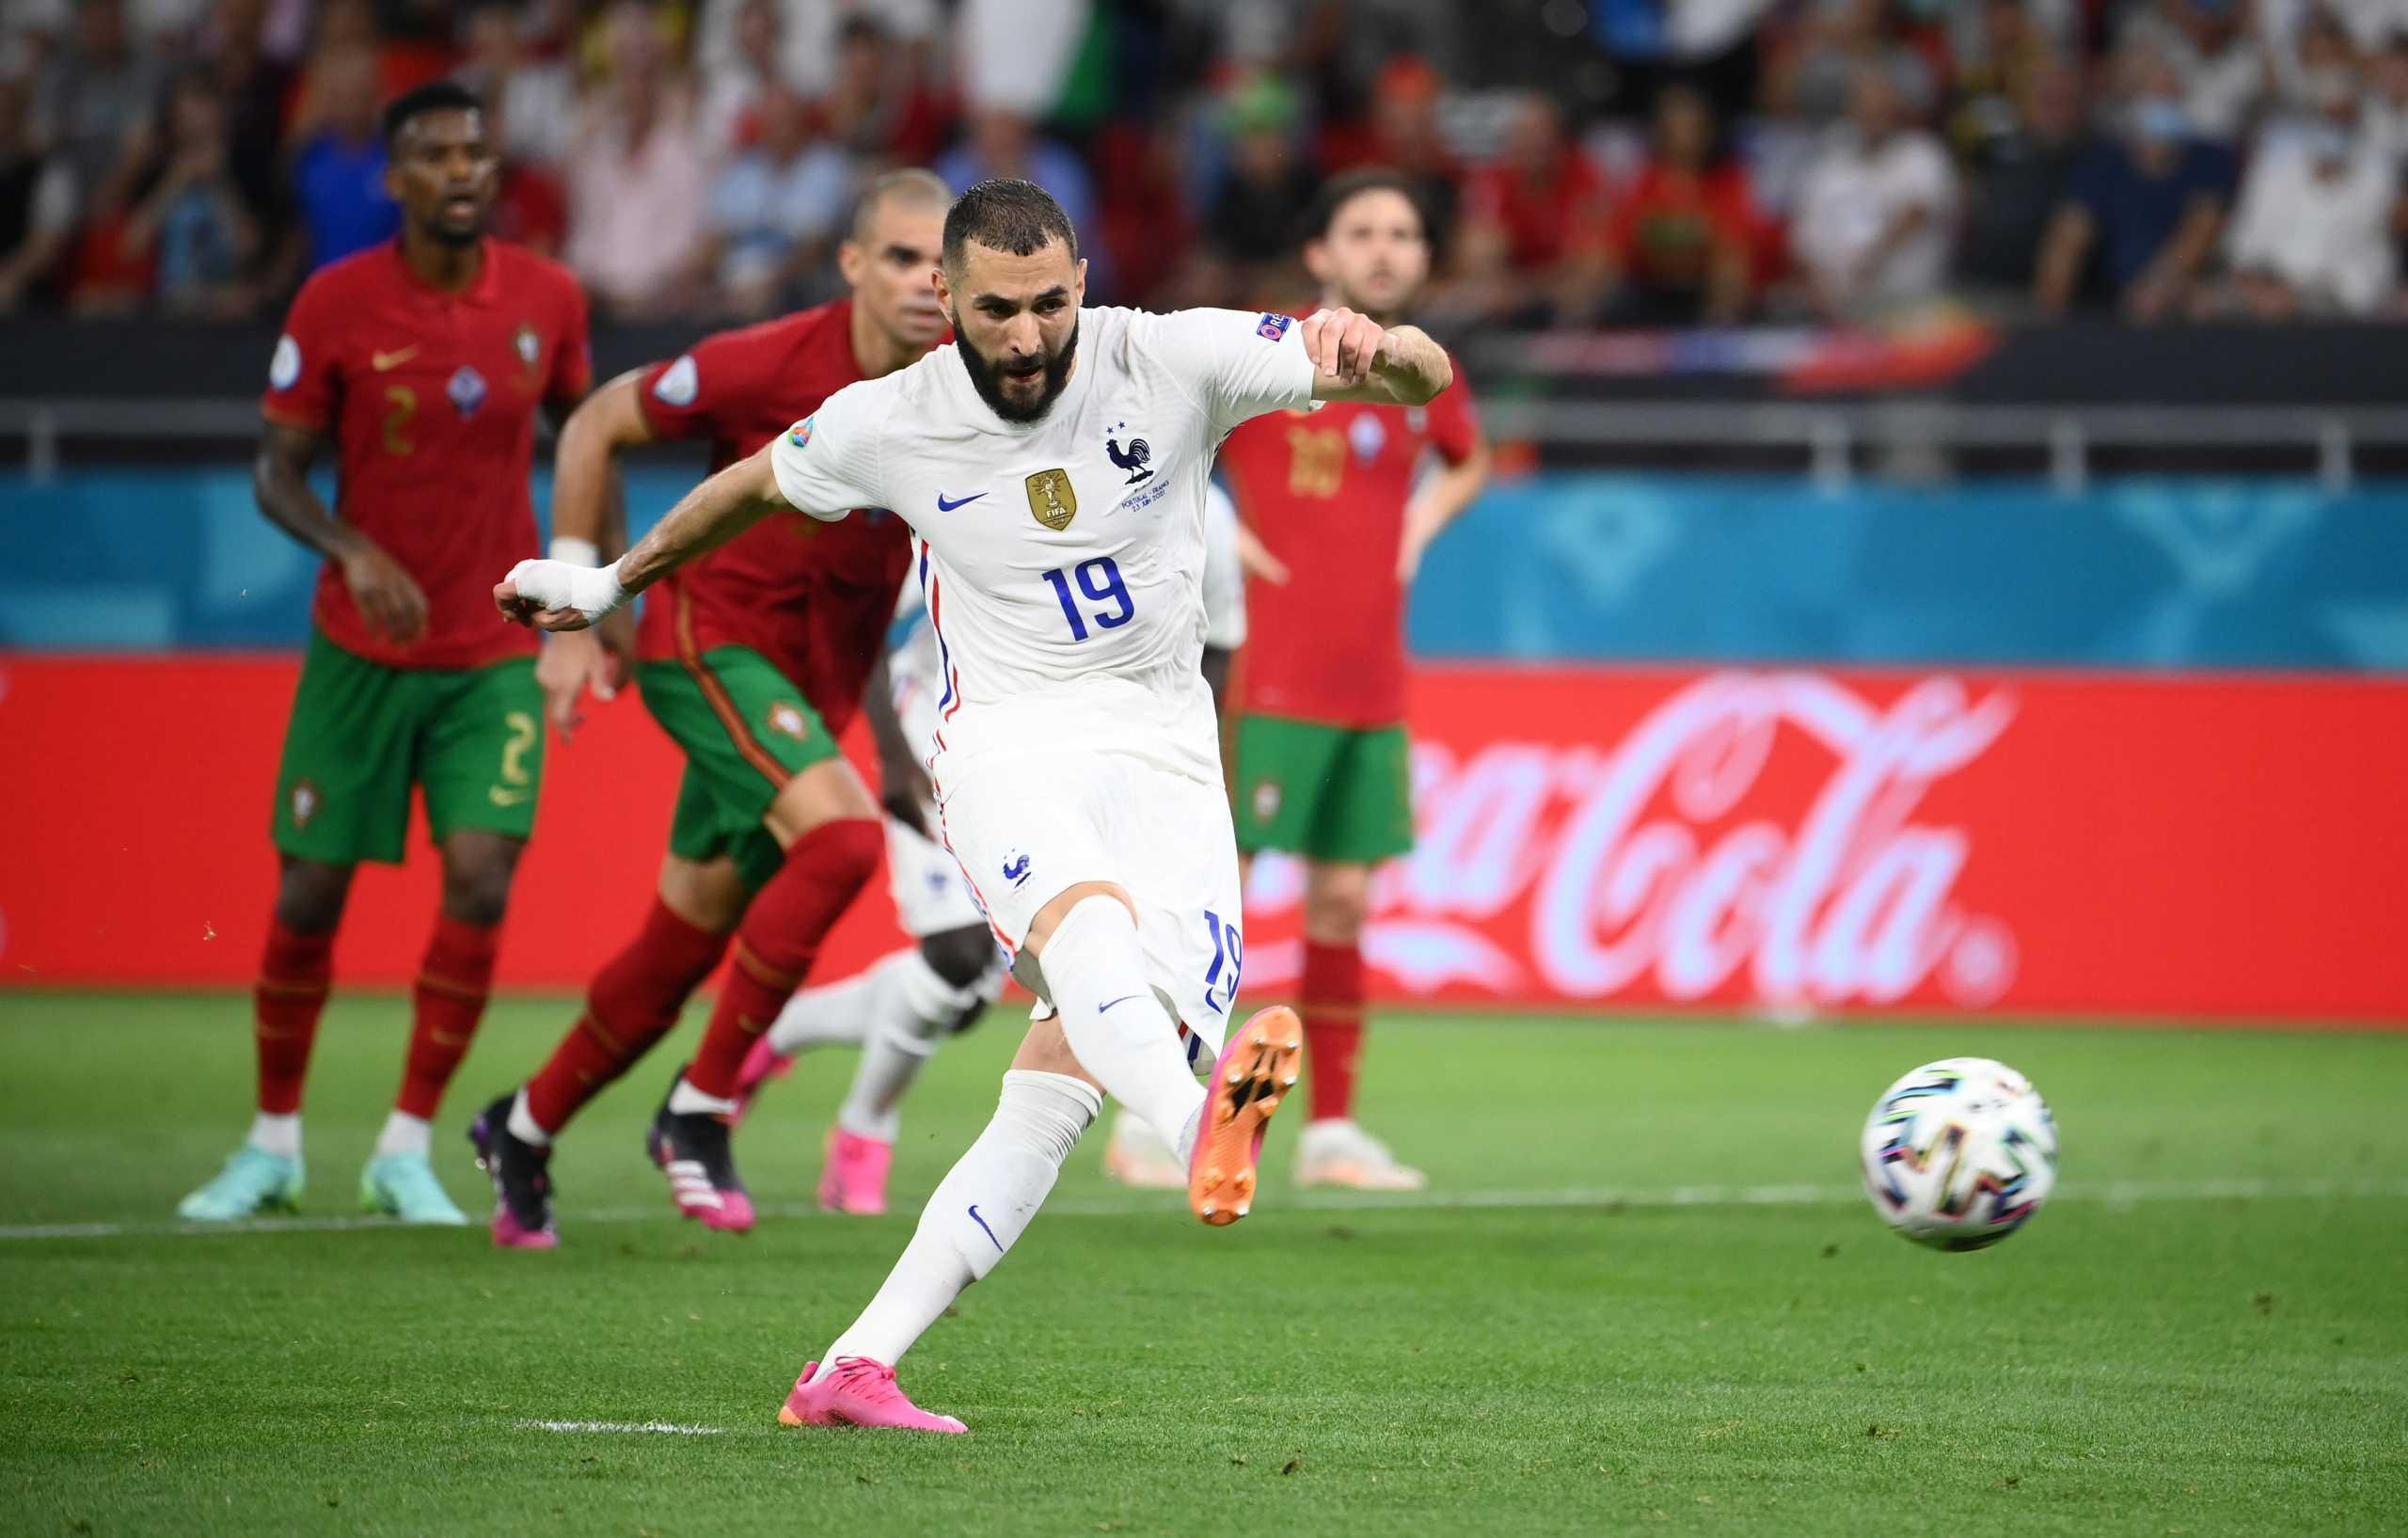 Euro 2020, Πορτογαλία – Γαλλία: Το υπερβολικό πέναλτι στον Σεμέδο για την ισοφάριση του Εμπαπέ